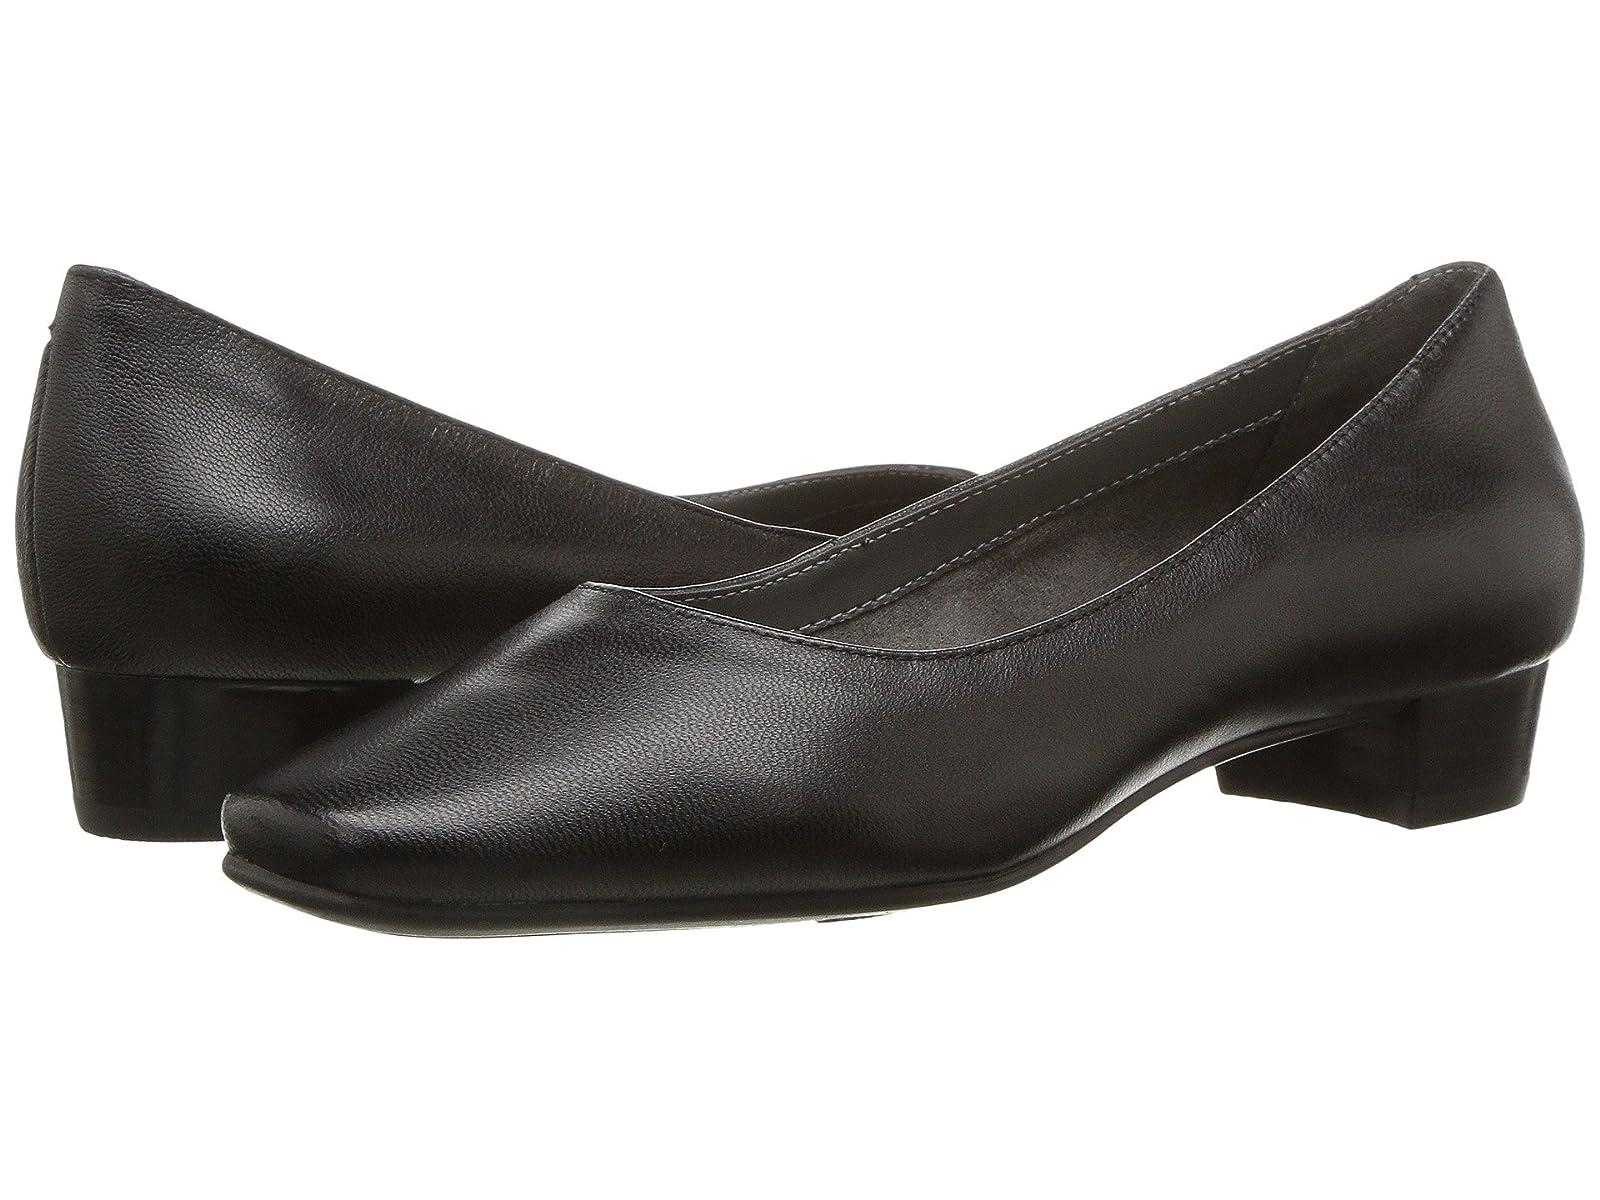 Aerosoles SubwayCheap and distinctive eye-catching shoes